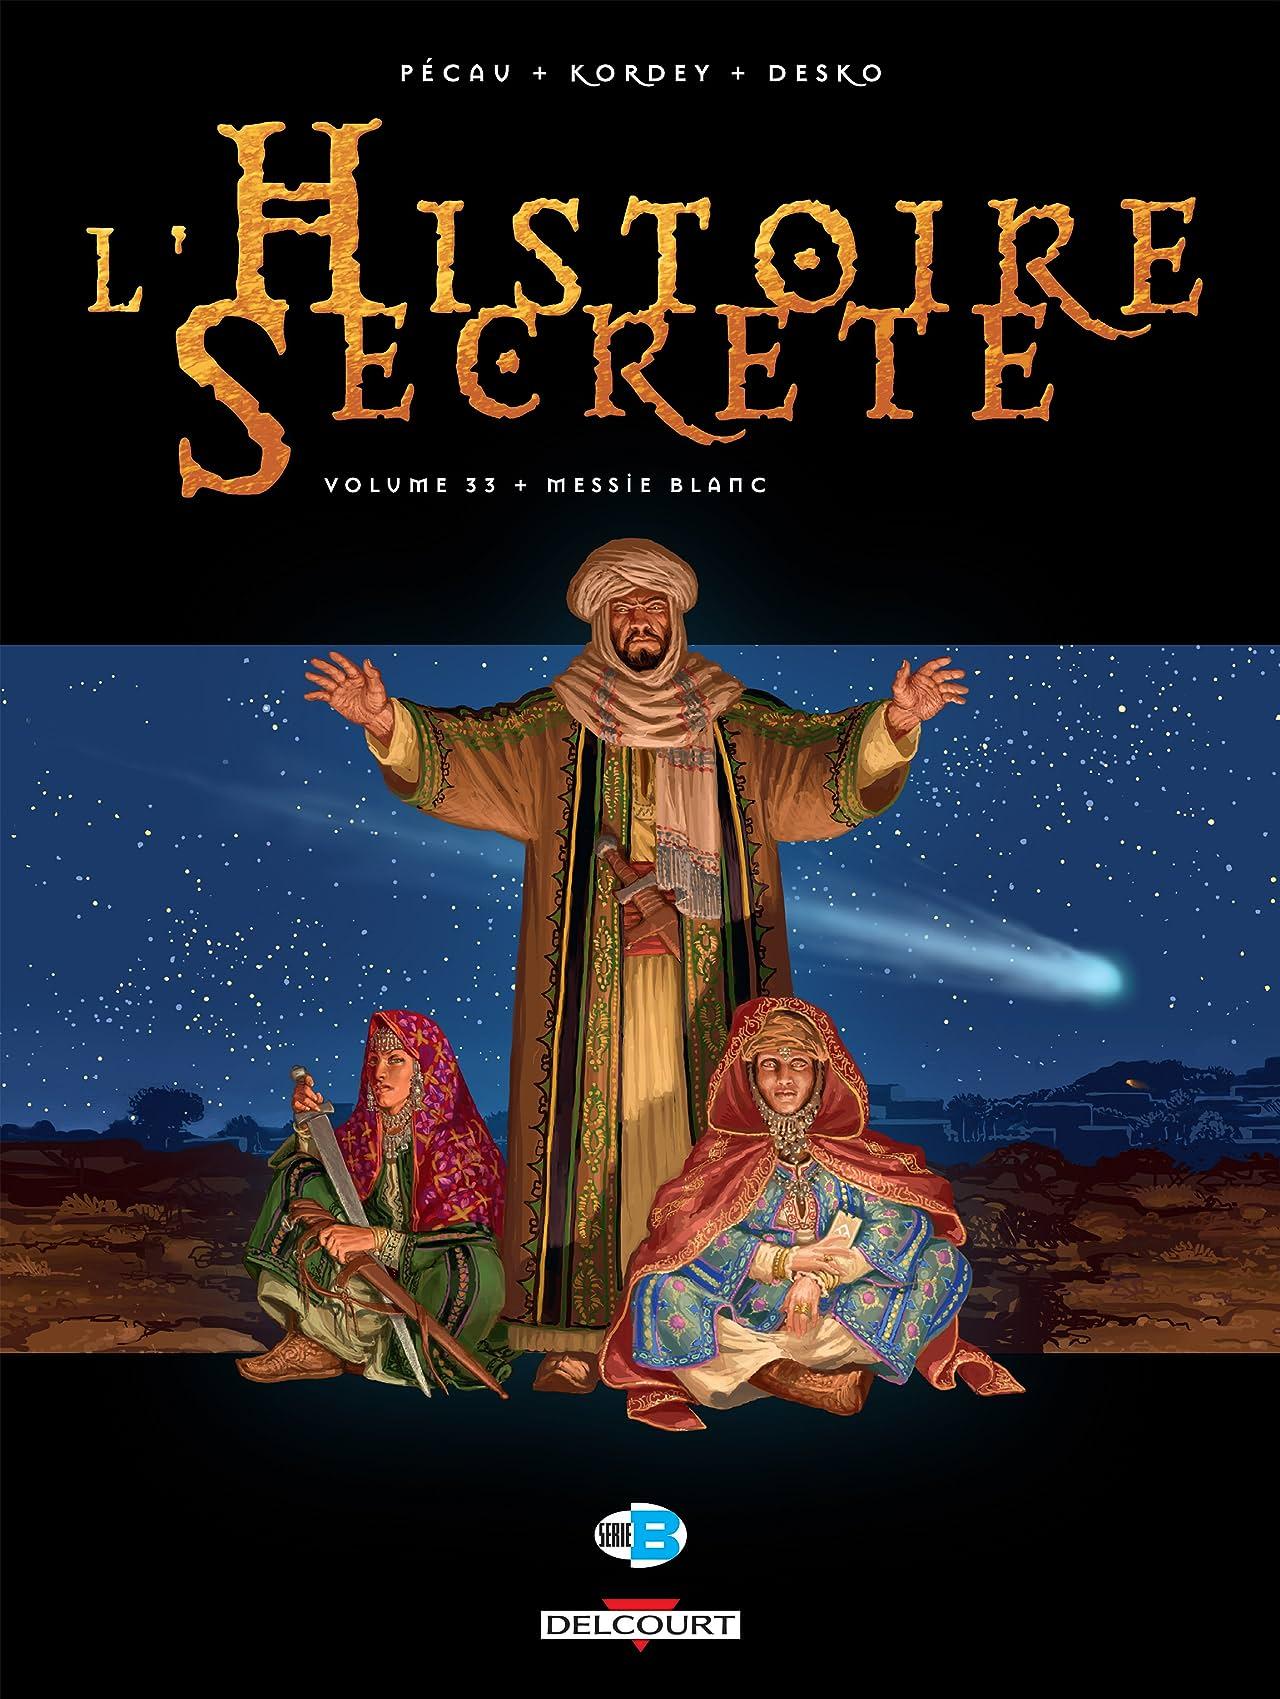 L'histoire secrète Vol. 33: Messie blanc